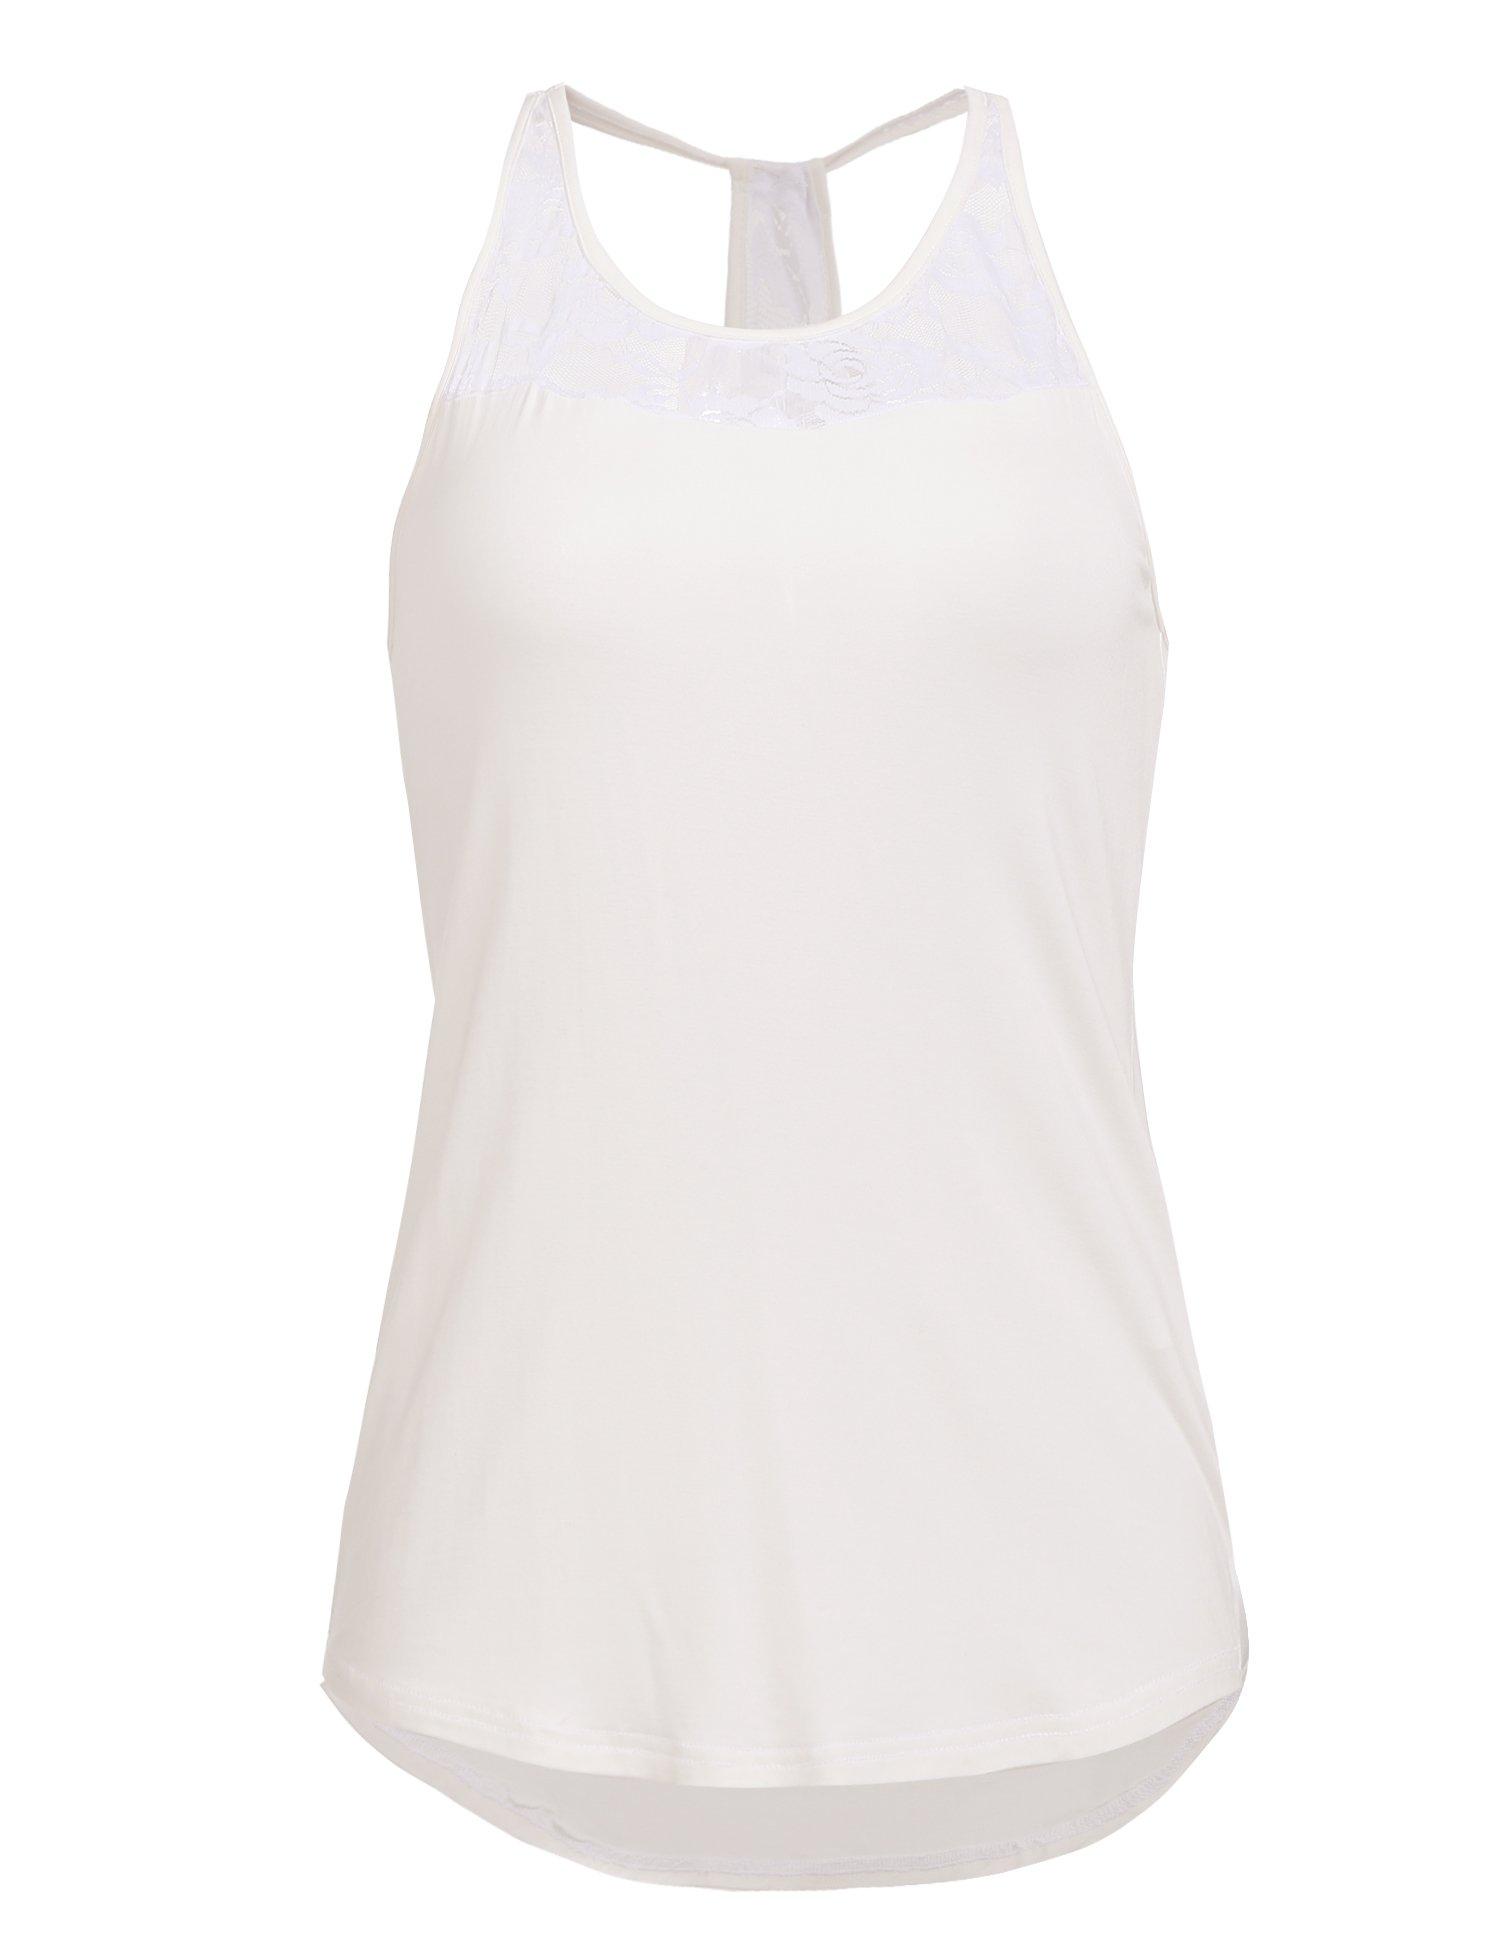 Mofavor Women's Sleeveless Crochet Lace Camisole Vest Halter Racerback Tank Top,White,Large by Mofavor (Image #2)